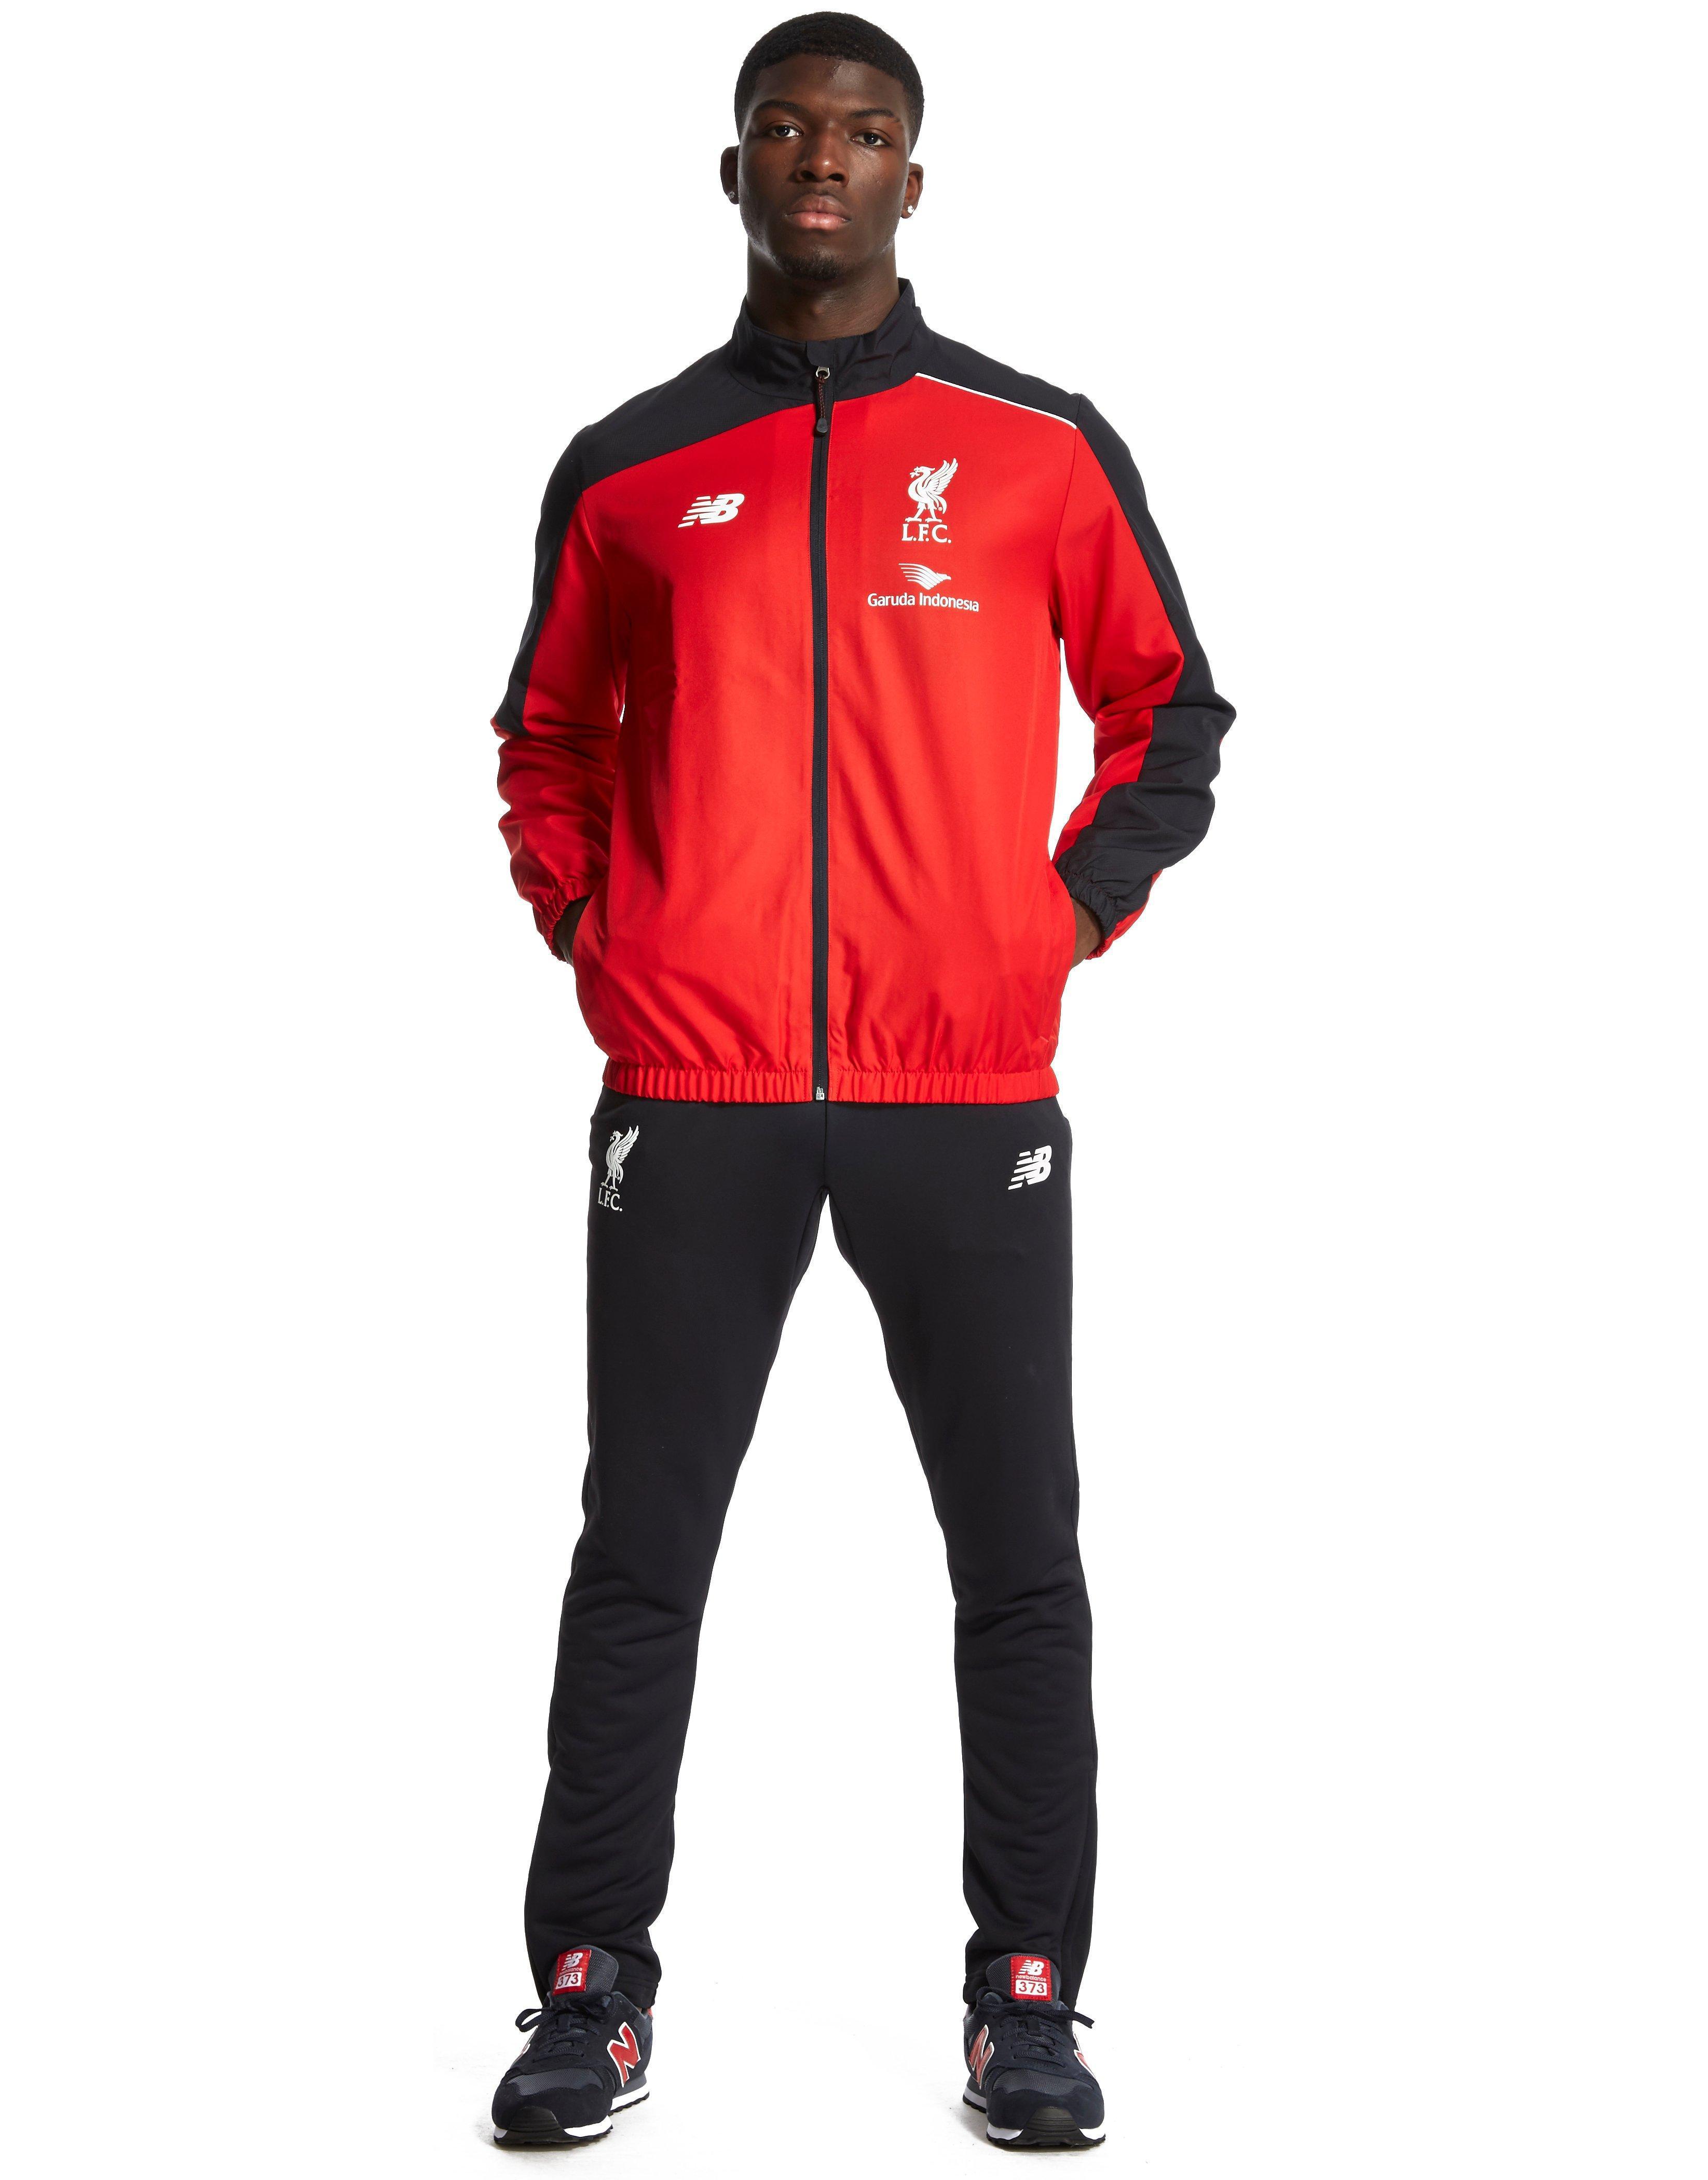 4bee19ae3a32f Black Balance New Liverpool In Training Fc For Pants Lyst Men U01vaw5f5q